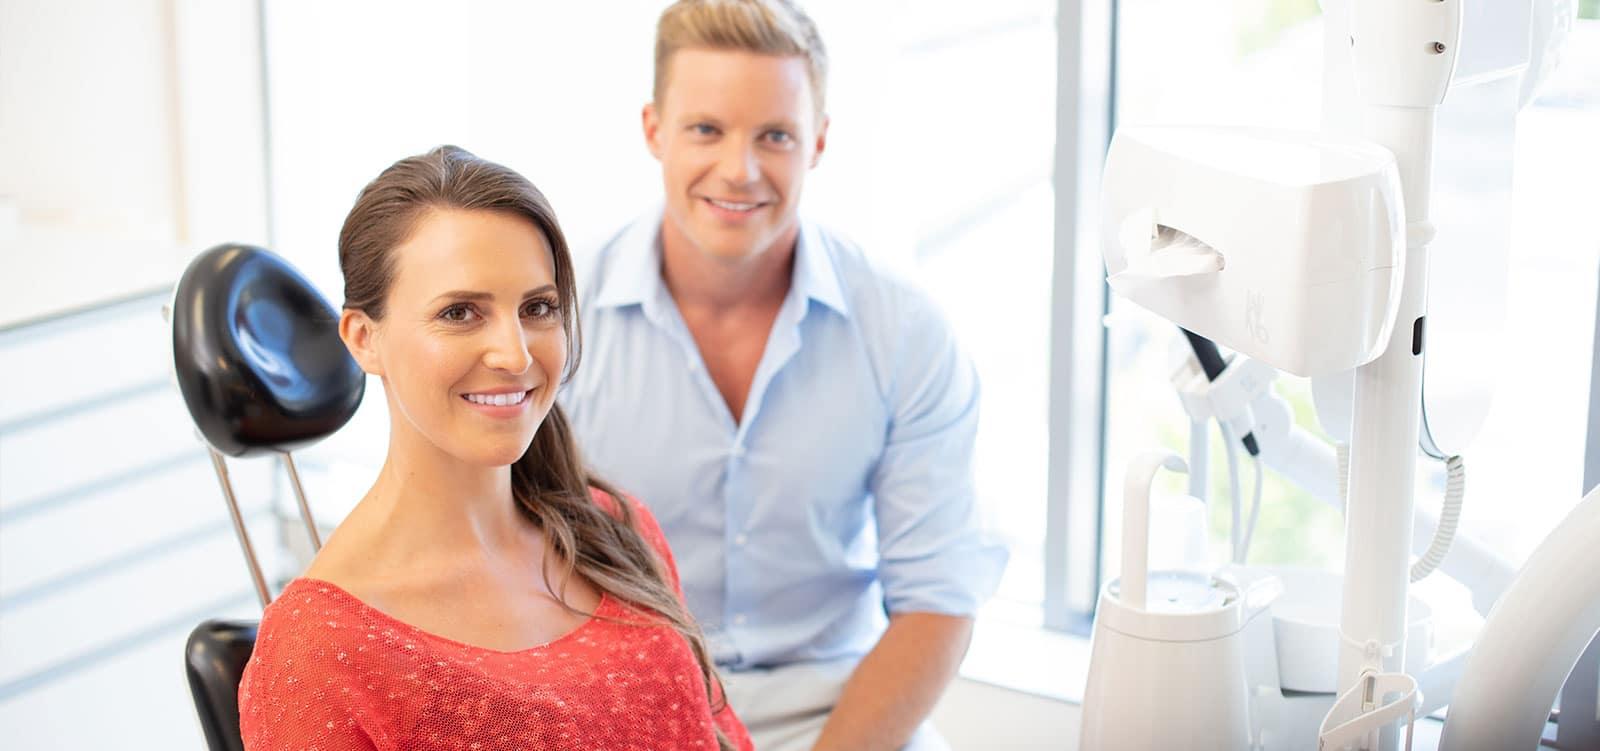 Zahnmedizinische Behandlungen